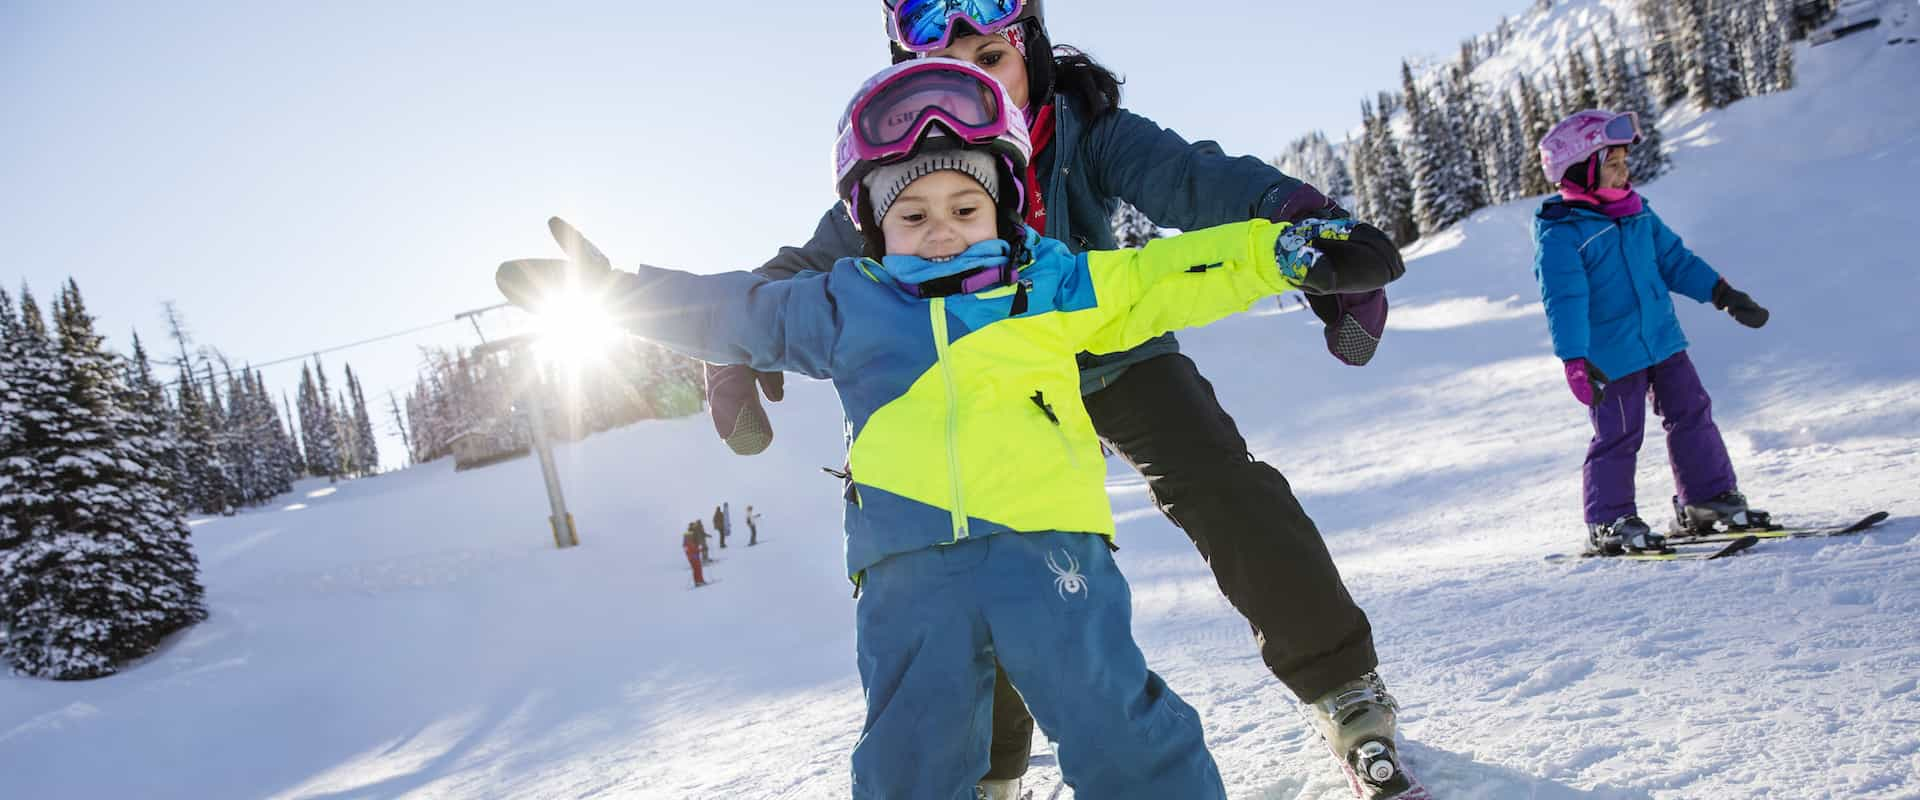 Take some family or children ski lessons at Sunshine Village Ski Resort